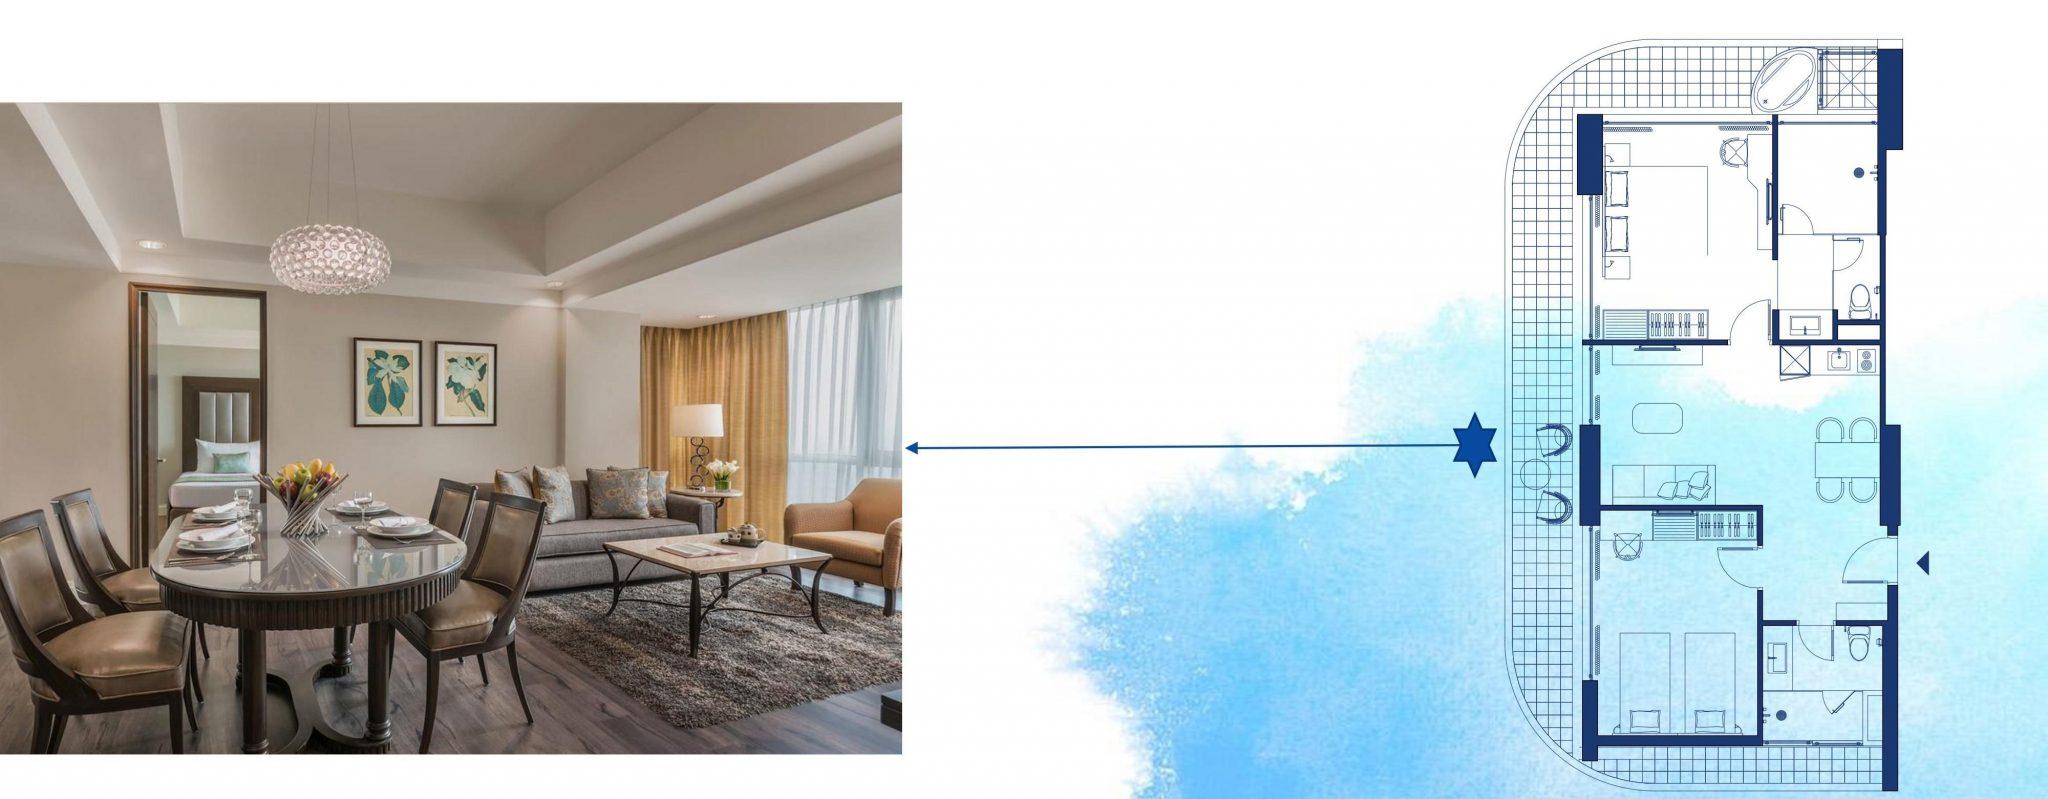 0046 e1563265665500 - Dự án căn hộ condotel Cam Ranh Bay - Pearl Cam Ranh